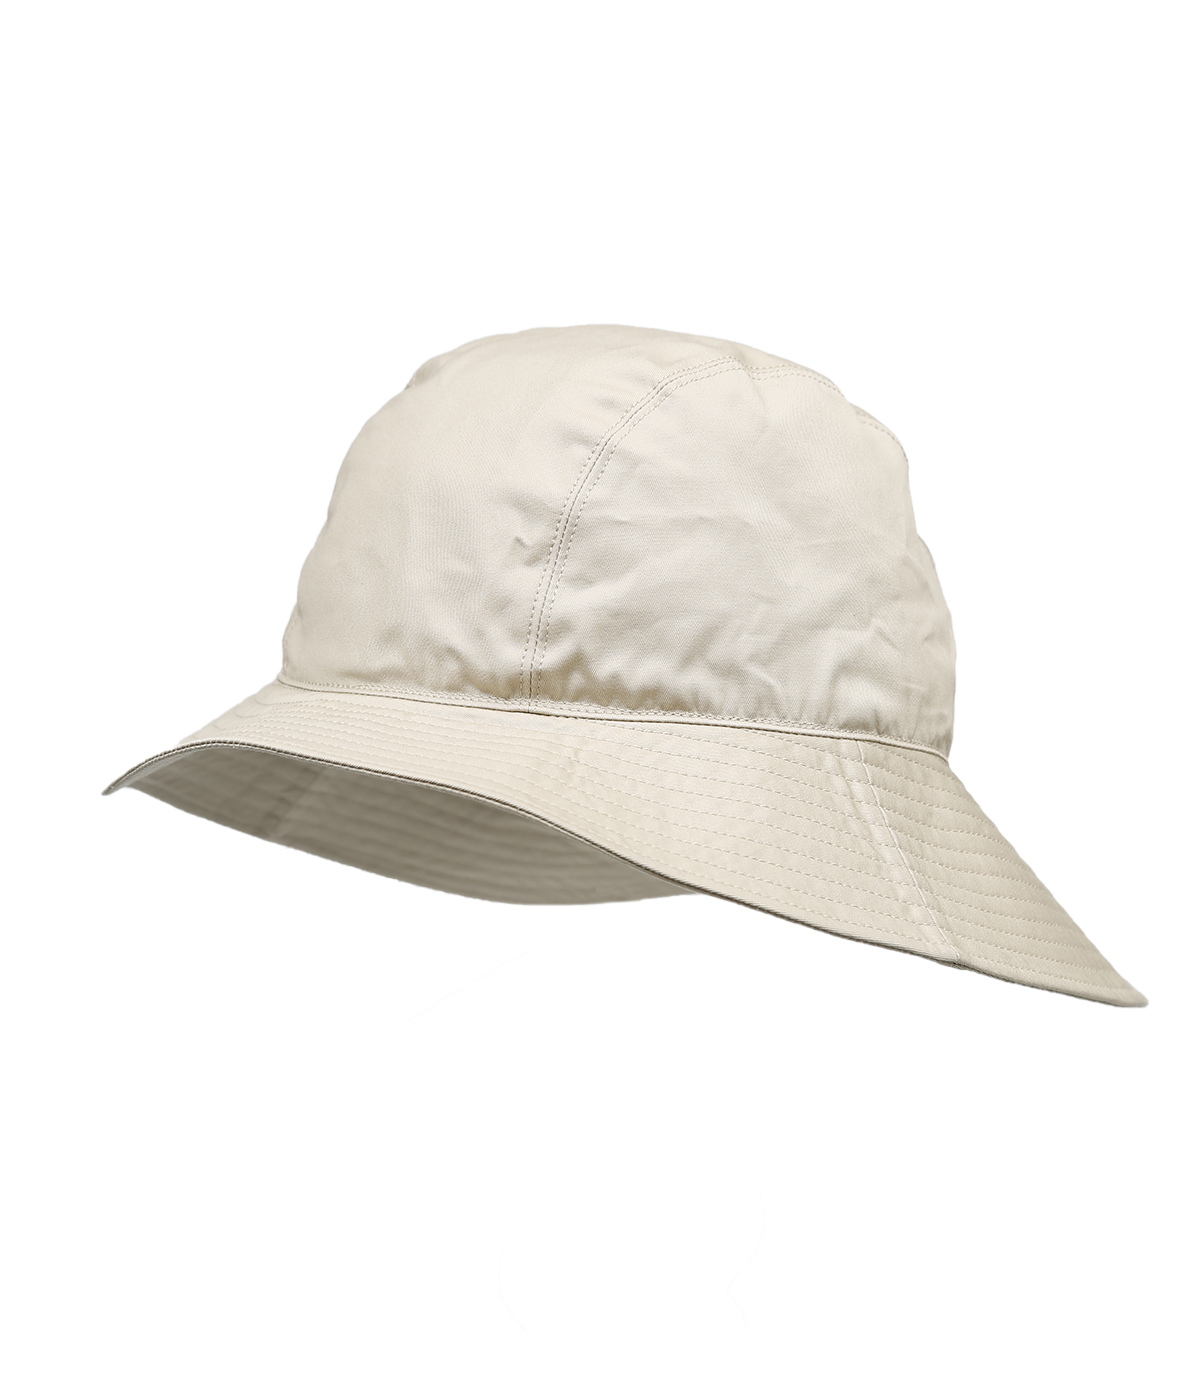 【別注】Sun Hat